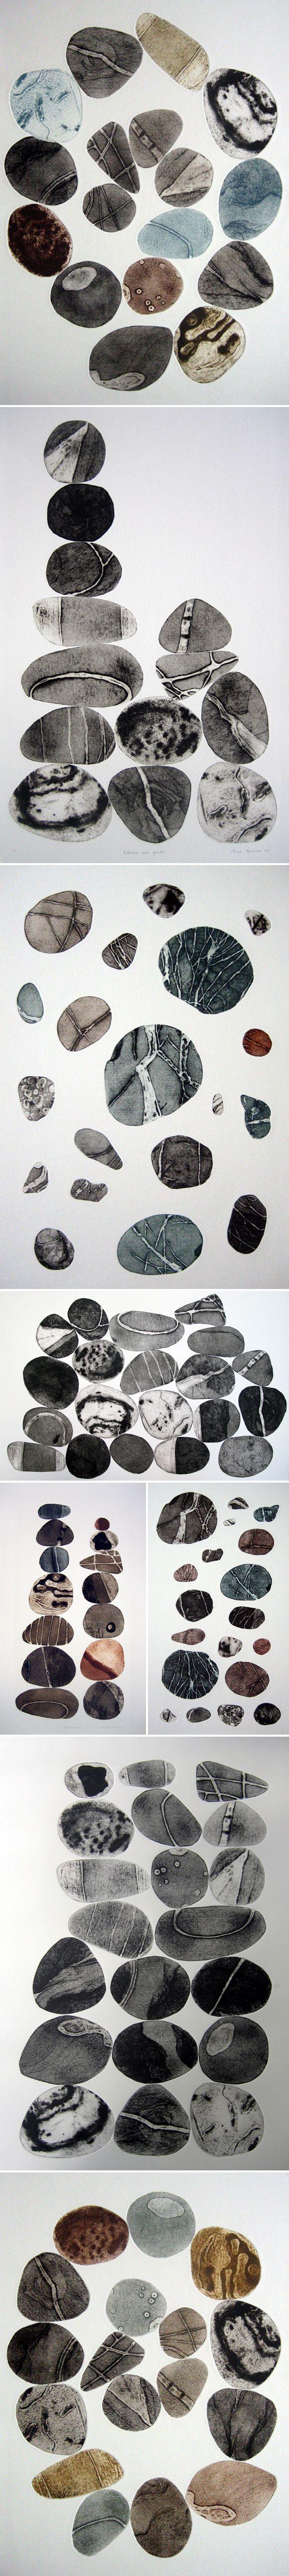 collagraph prints by tessa horrocks